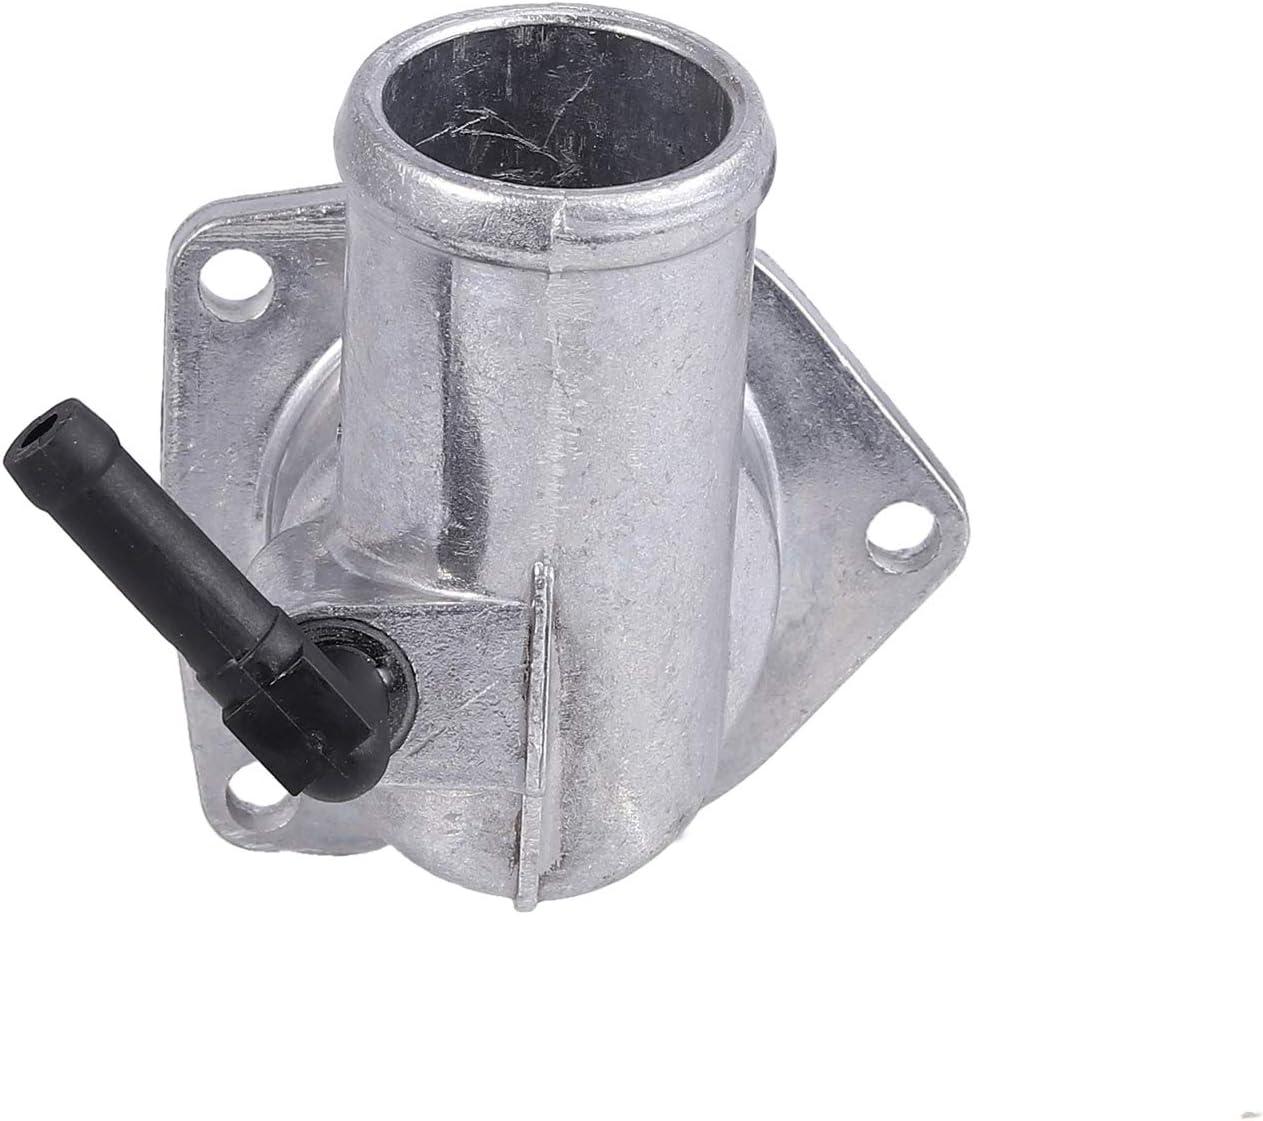 Autoutlet Thermostat Gehäuse Für Opel Astra G Corsa C Meriva A Vectra C Zafira B 1 4 1 6 1338331 90573326 Auto